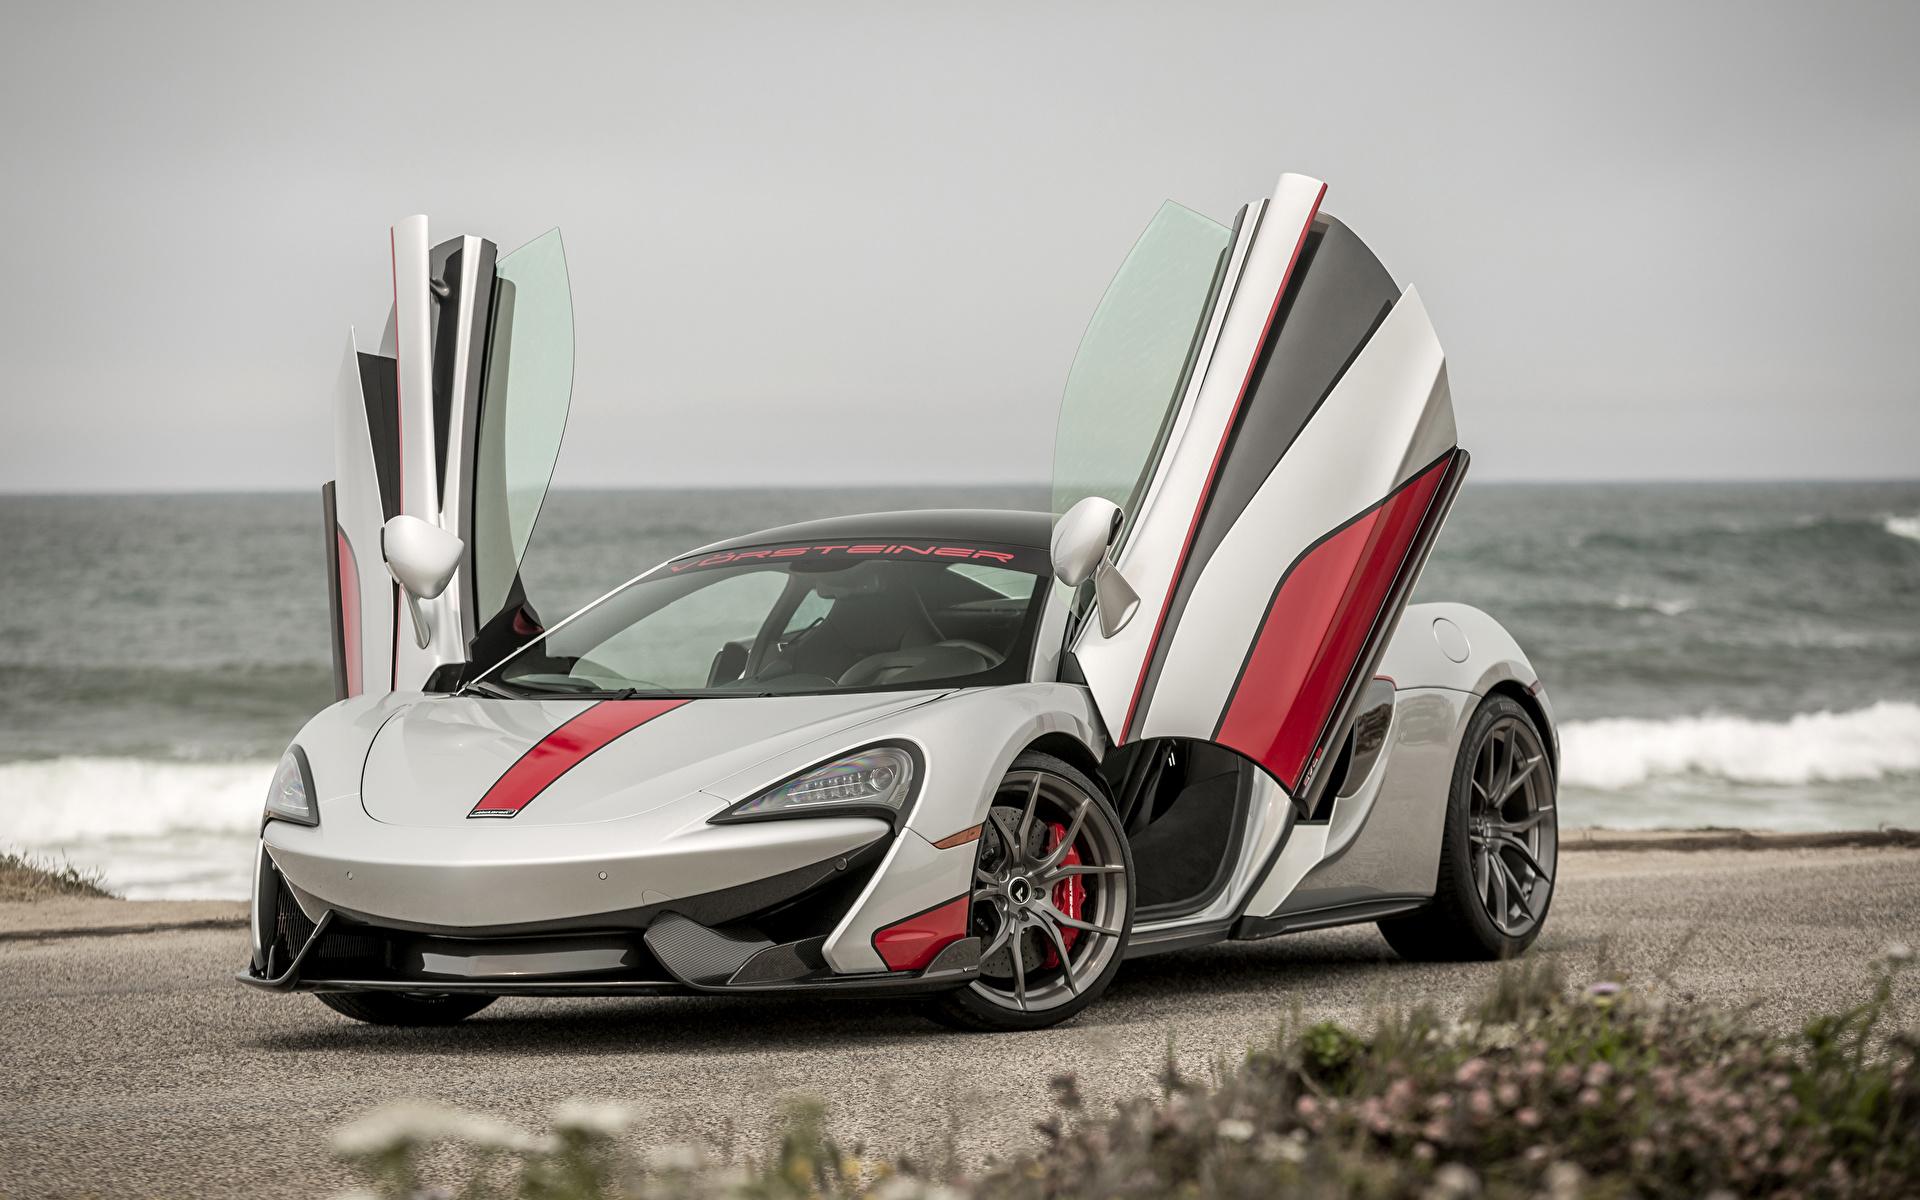 Achtergronden Auto Tuning McLaren 2016 Vorsteiner 570-VX Zilveren kleur Open deur 1920x1200 auto's automobiel